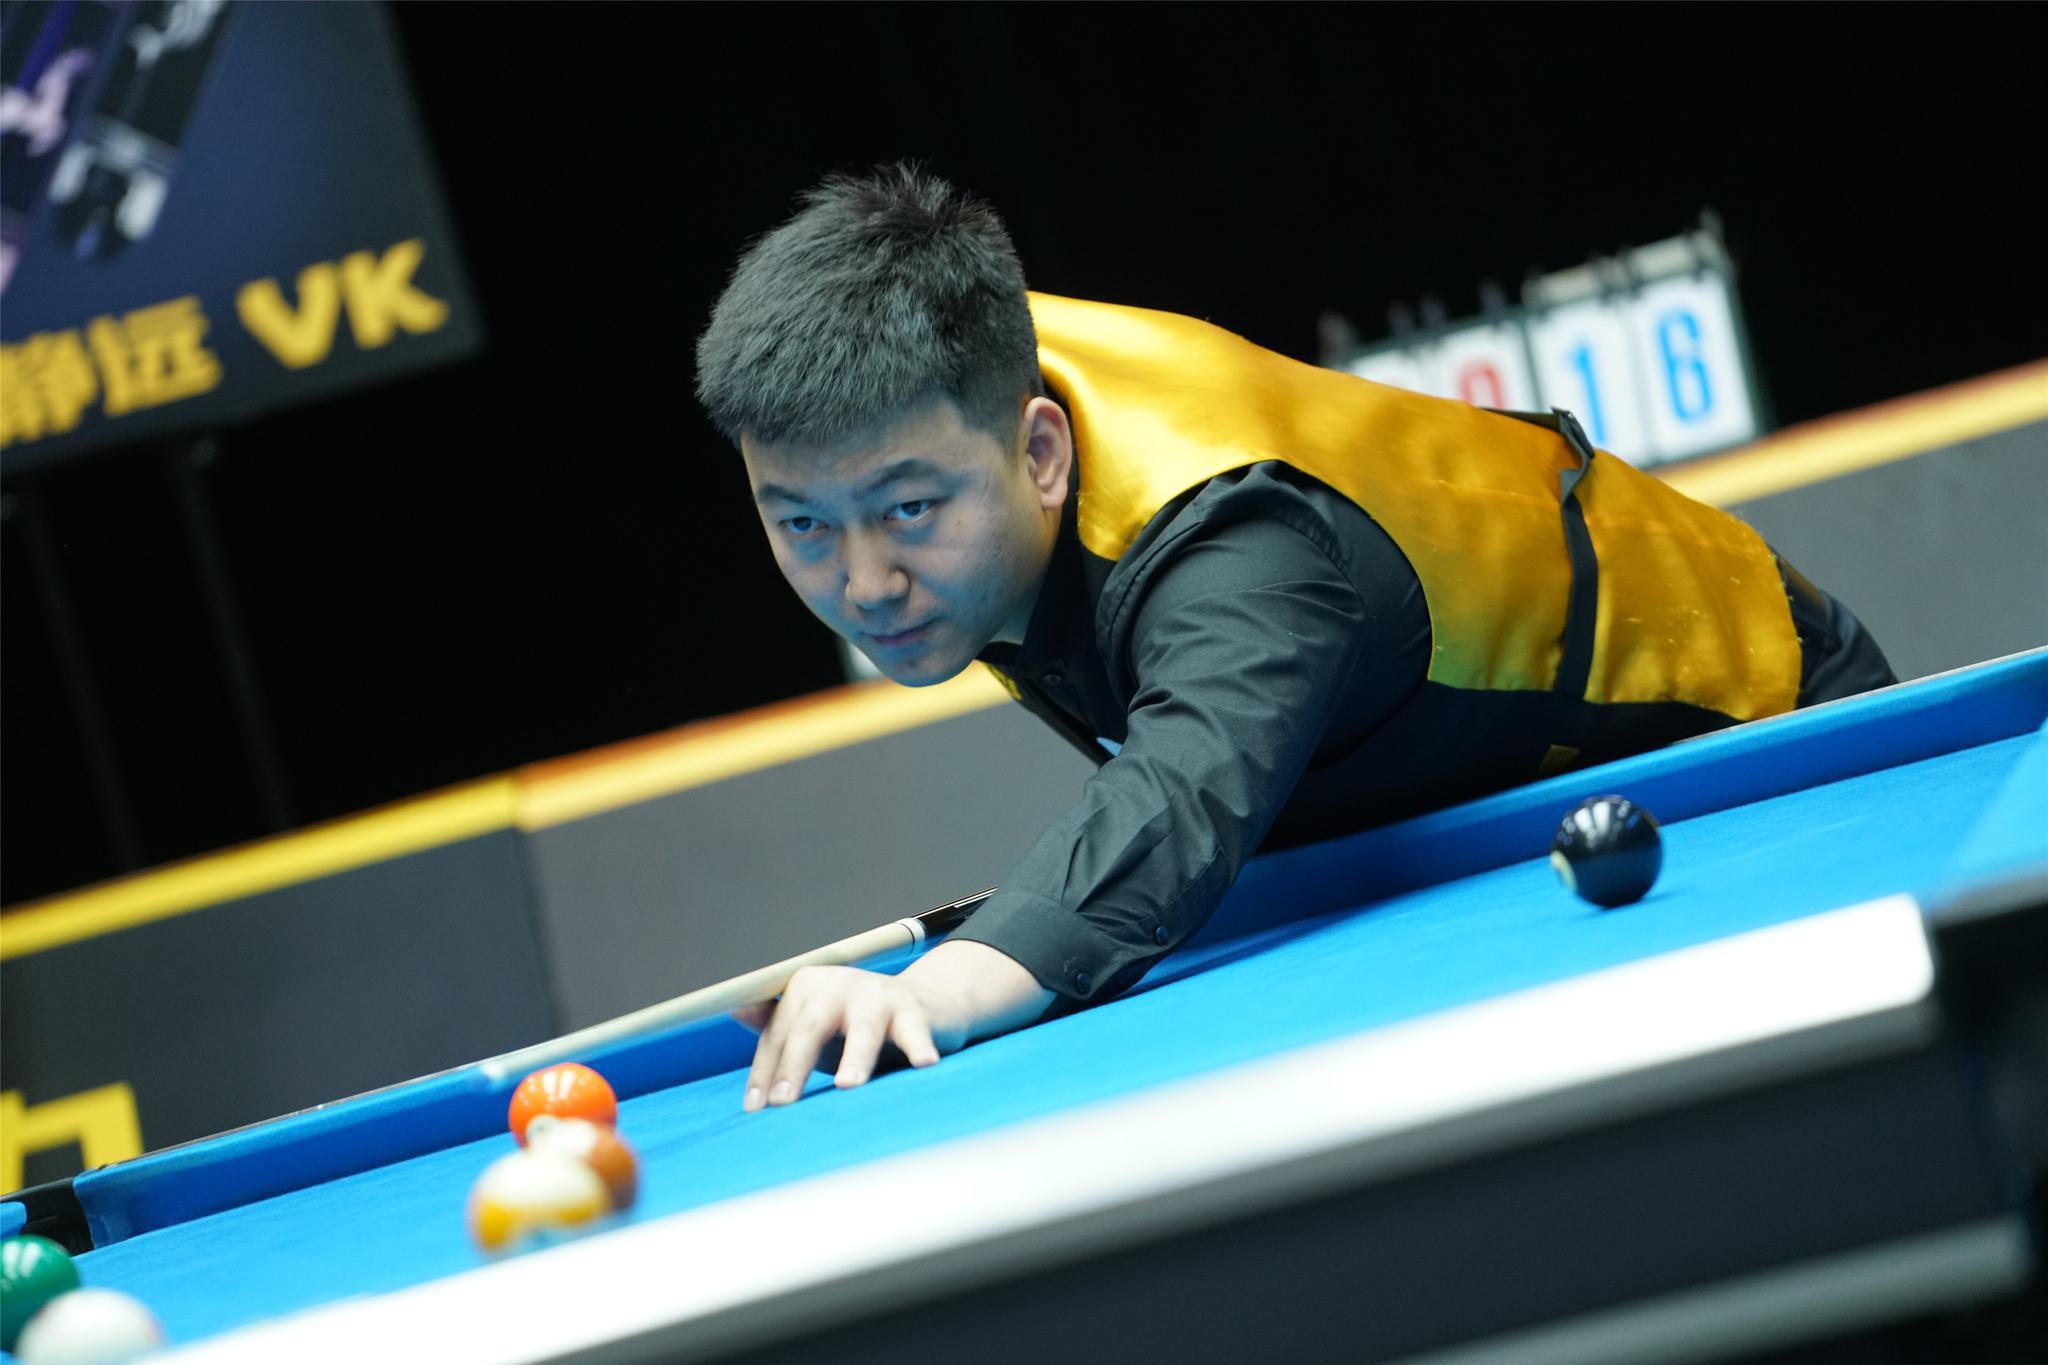 【LCBA中式九球擂台赛】秦超VS马红军争夺最后一位四强名额